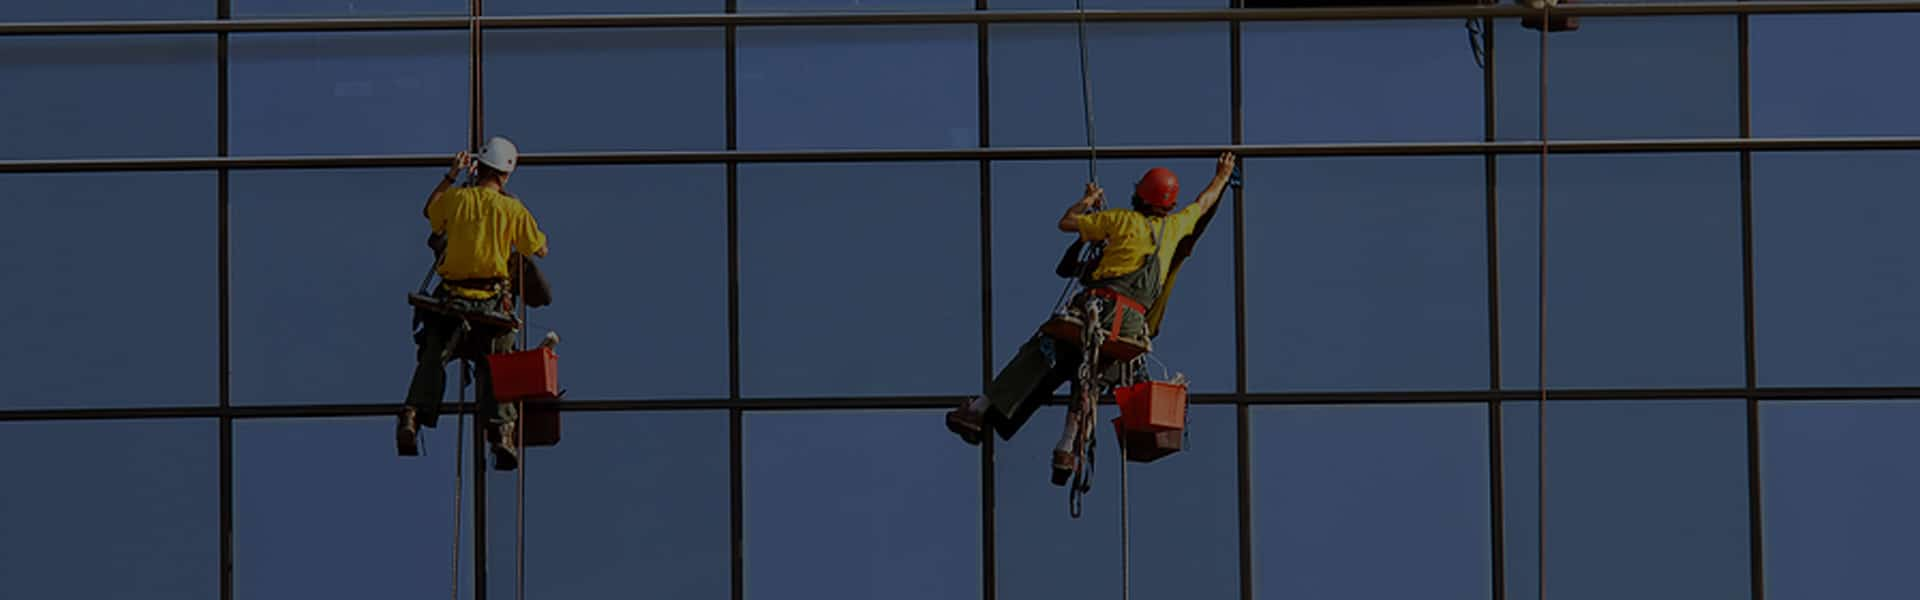 Maintenance-Management-System